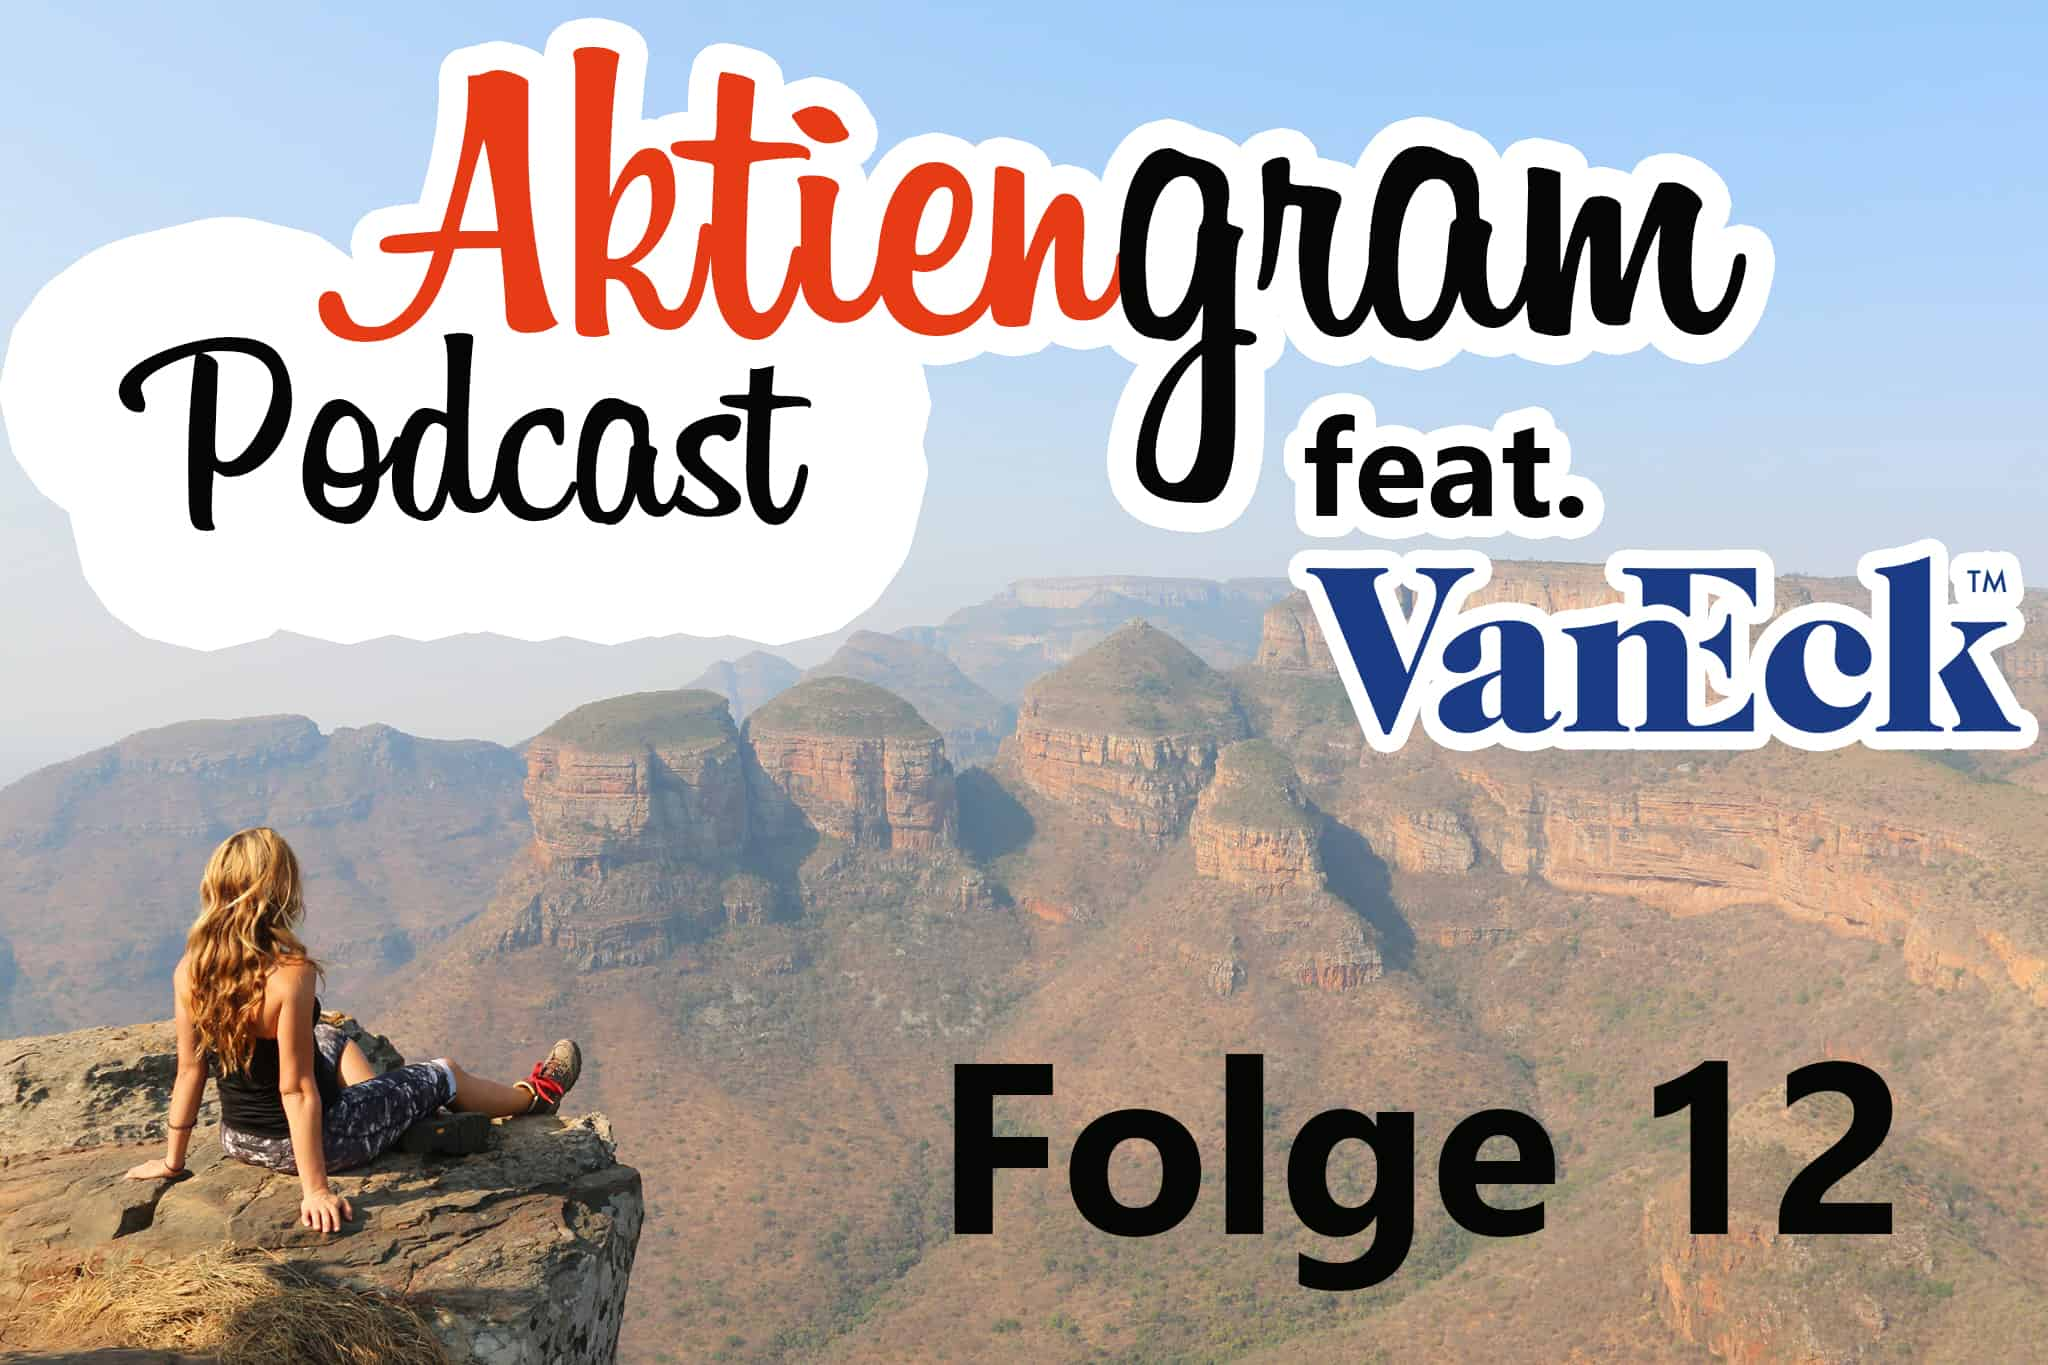 Aktiengram Podcast